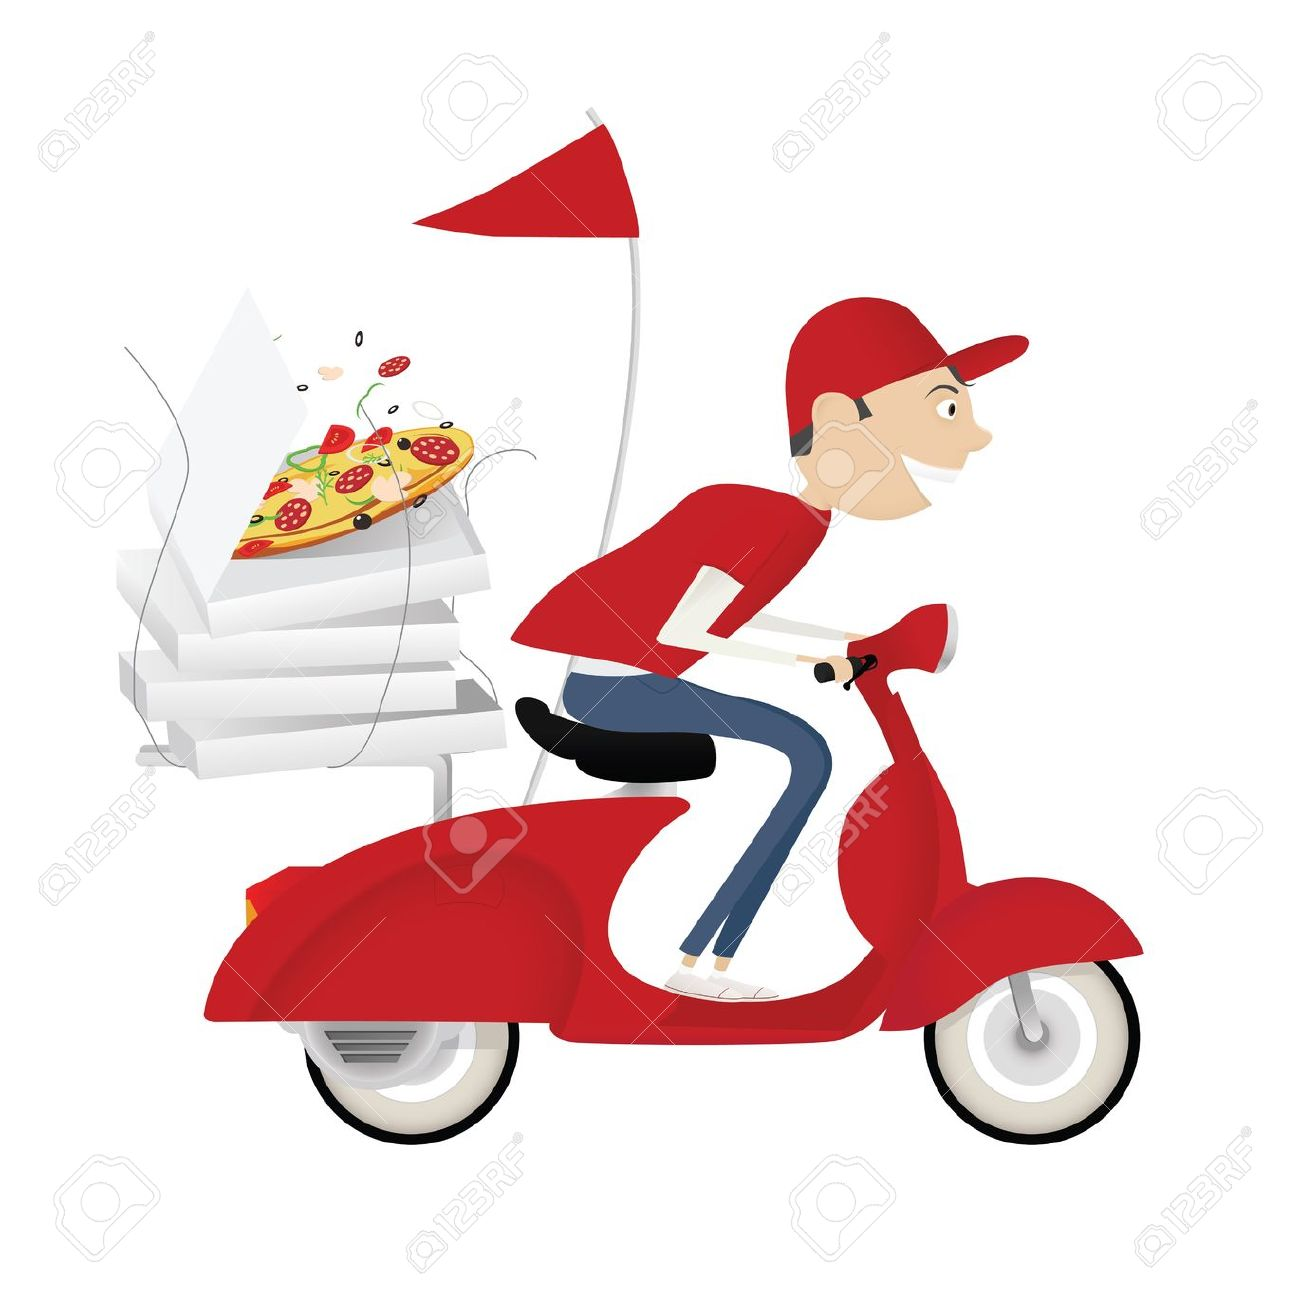 1300x1300 Bike Clipart Pizza Delivery